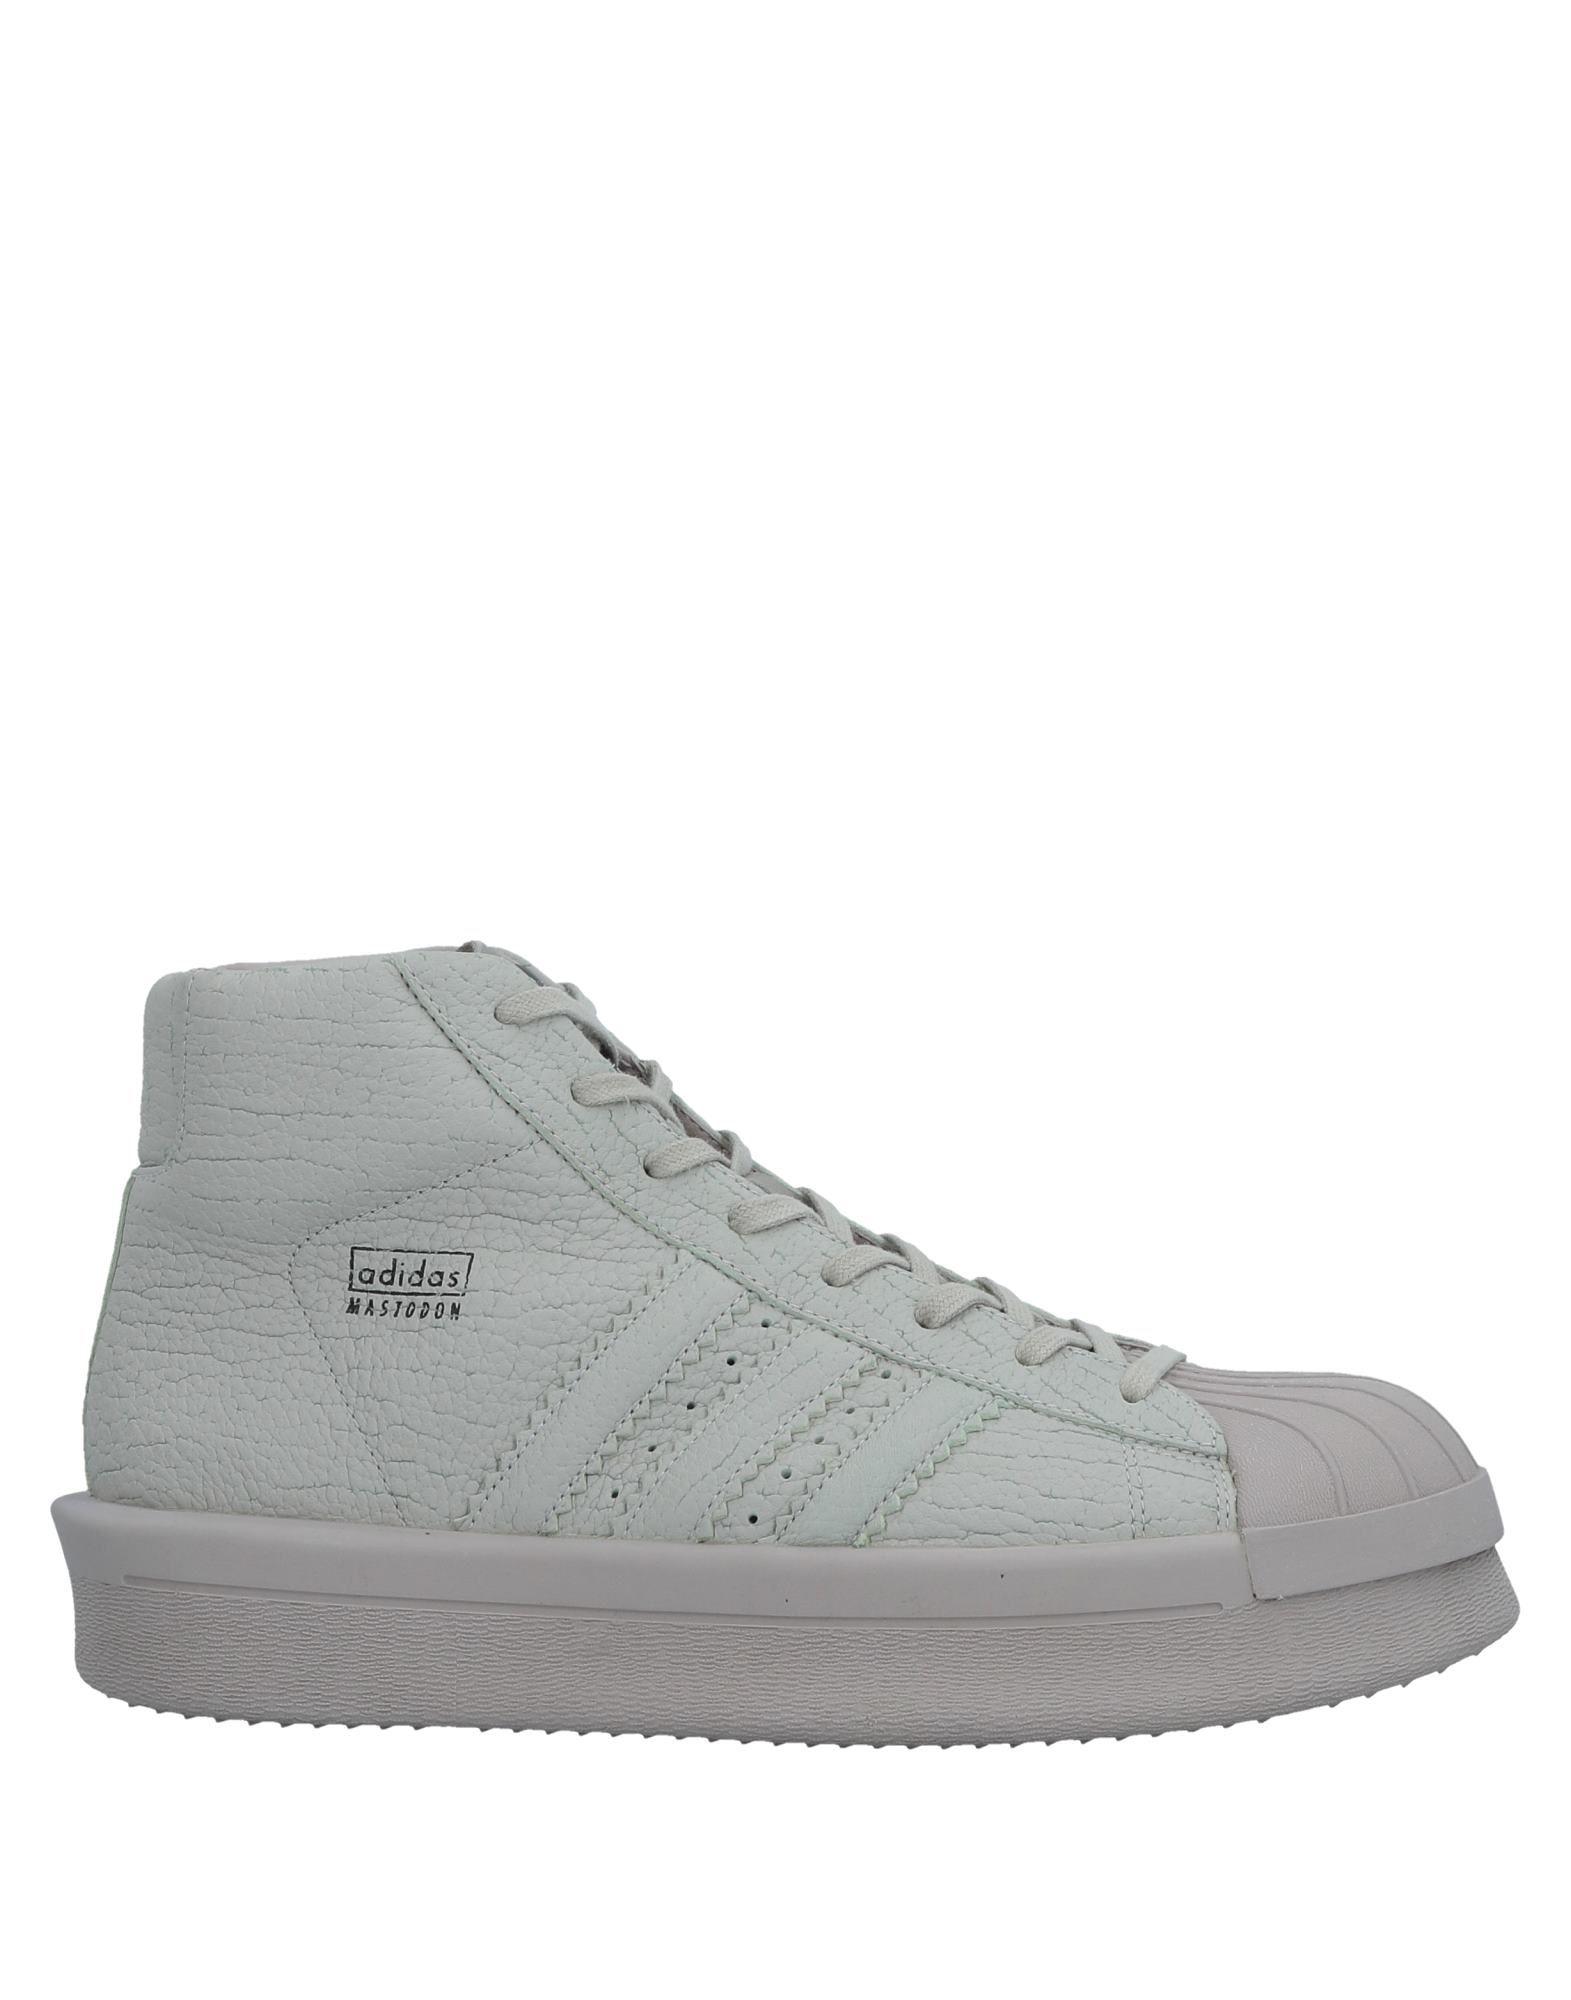 Rick Owens X Adidas Sneakers Herren  11516228HI Heiße Schuhe